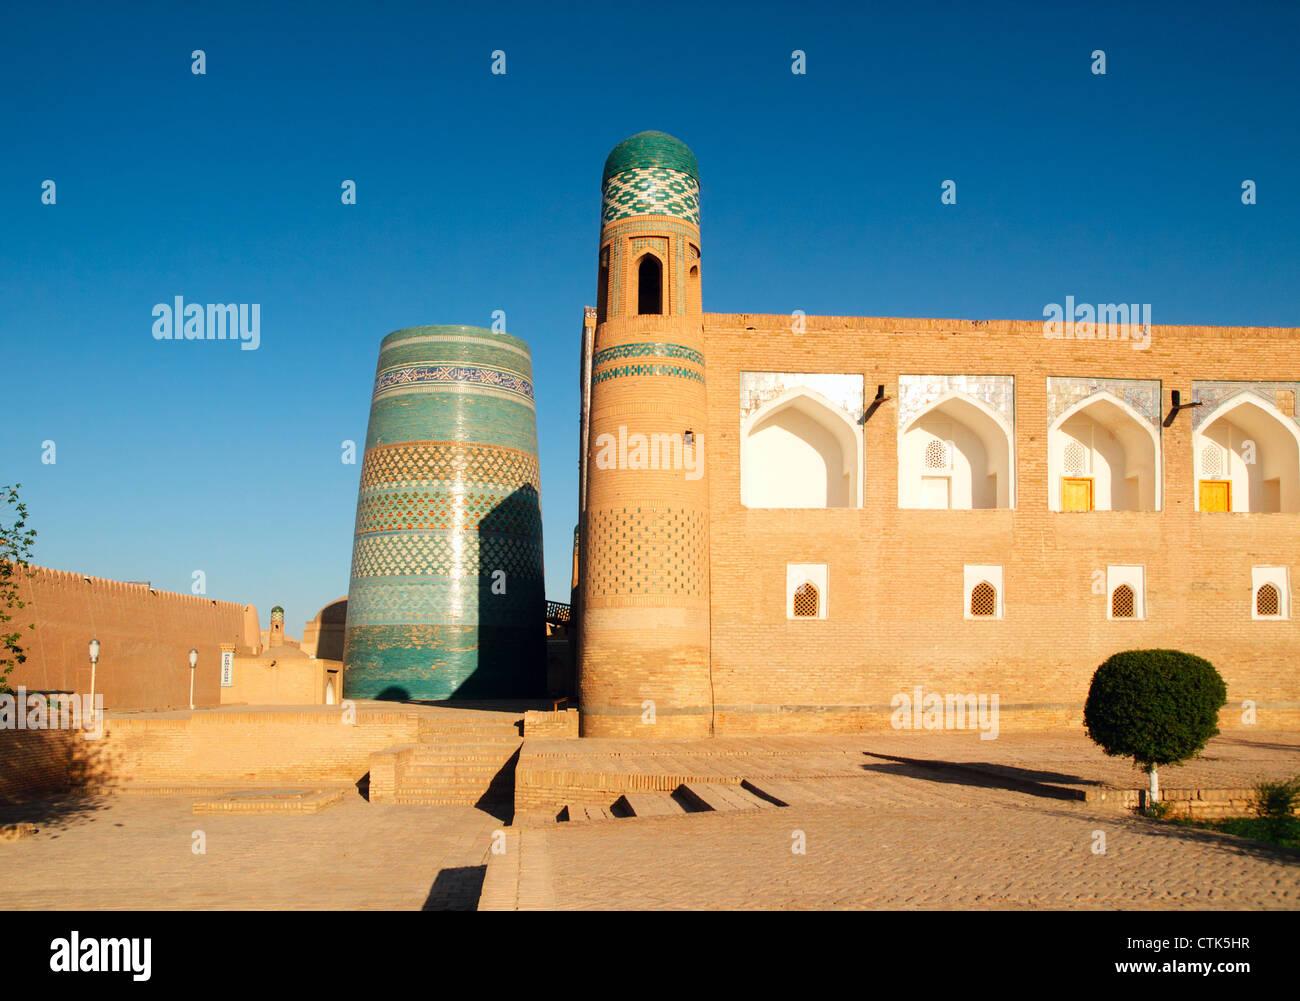 Madrasas and minoret in Khiva, Uzbekistan - Stock Image